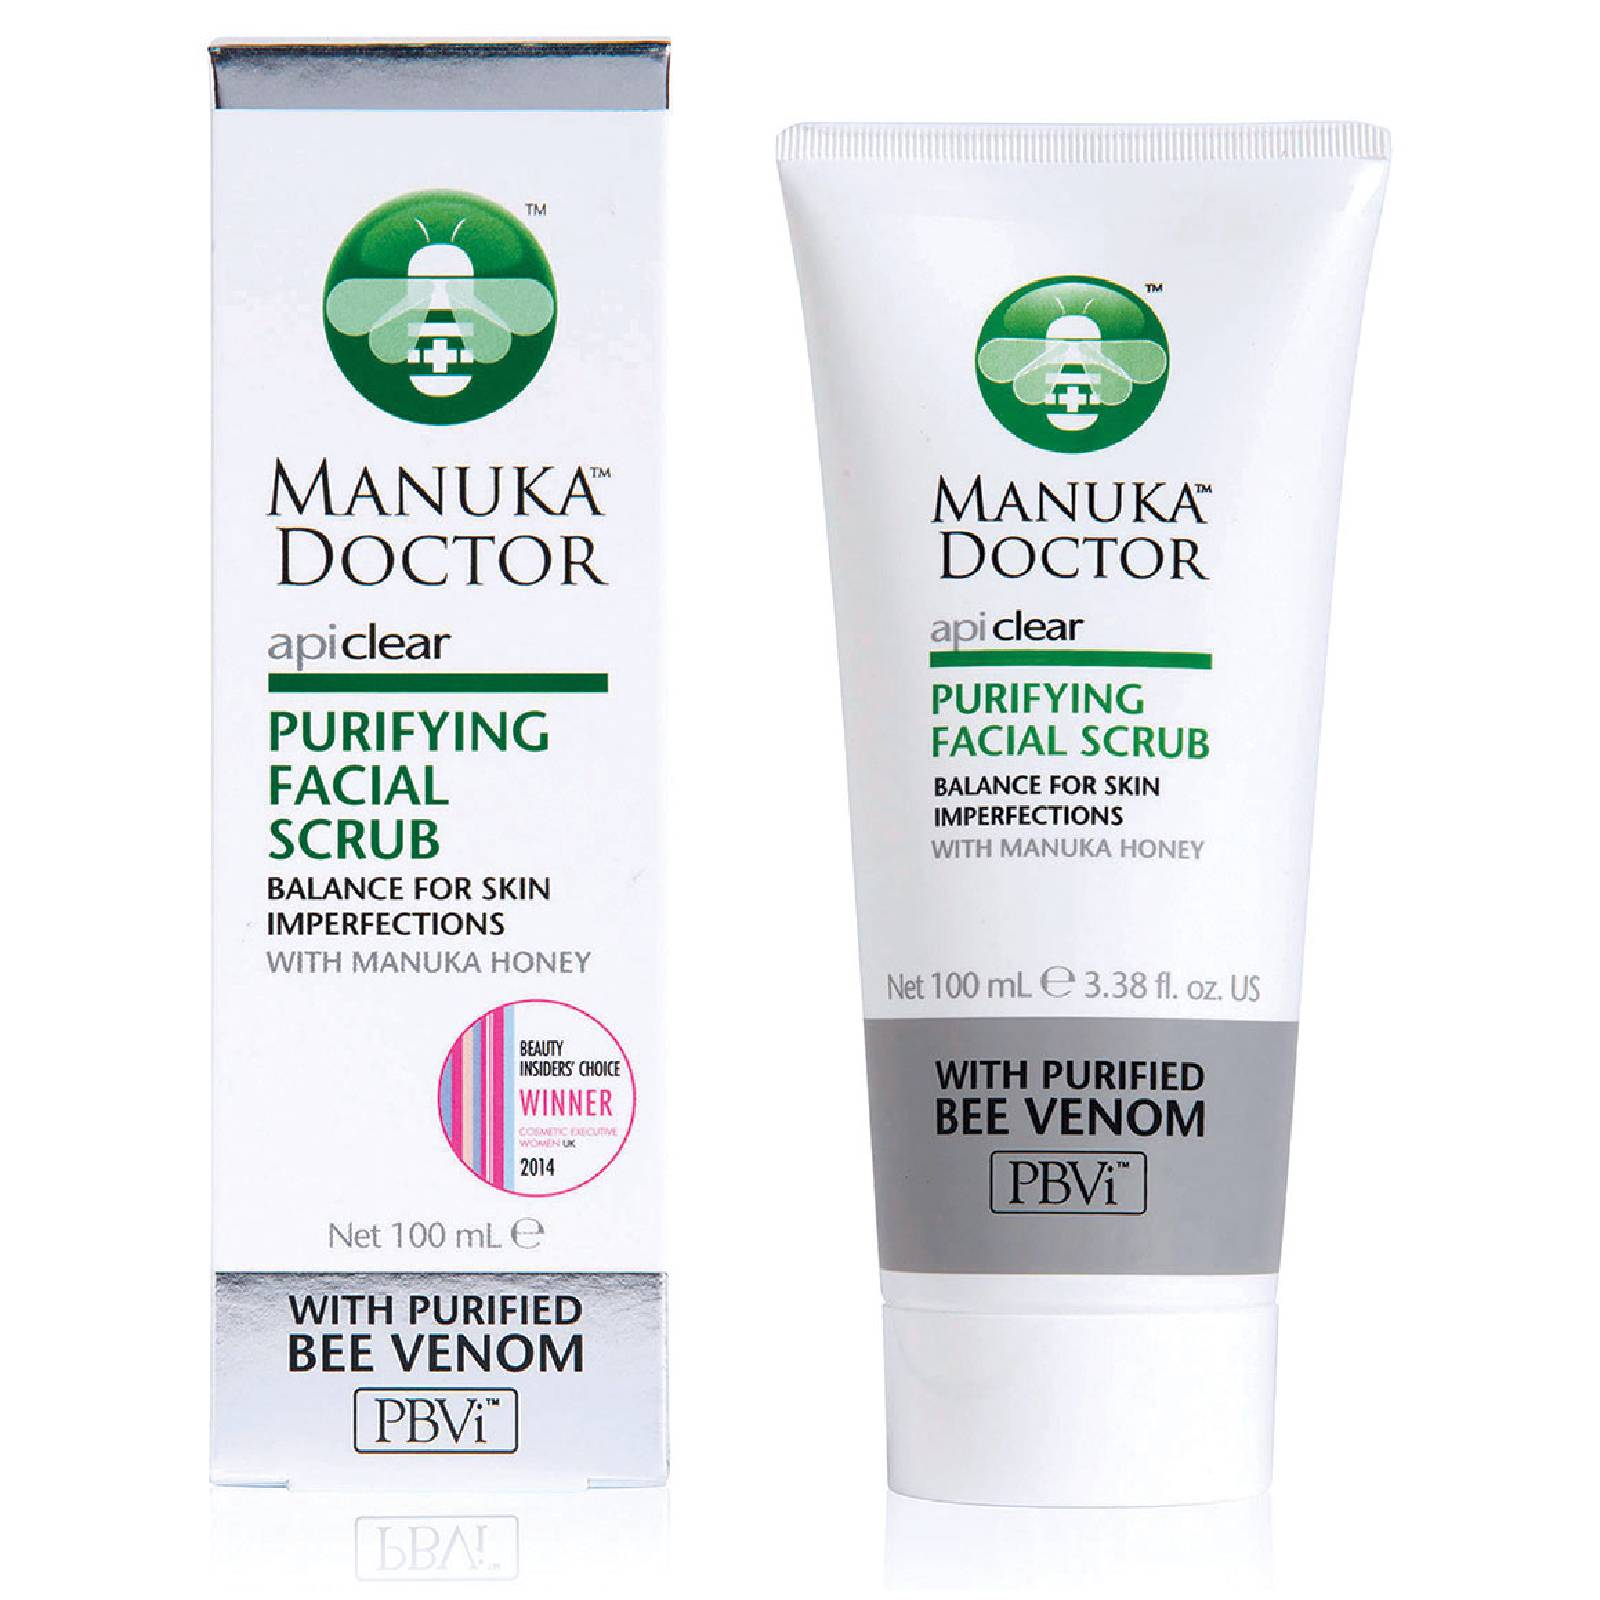 Manuka Doctor Exfoliant FacialPurifyingApiClear Manuka Doctor100 ml